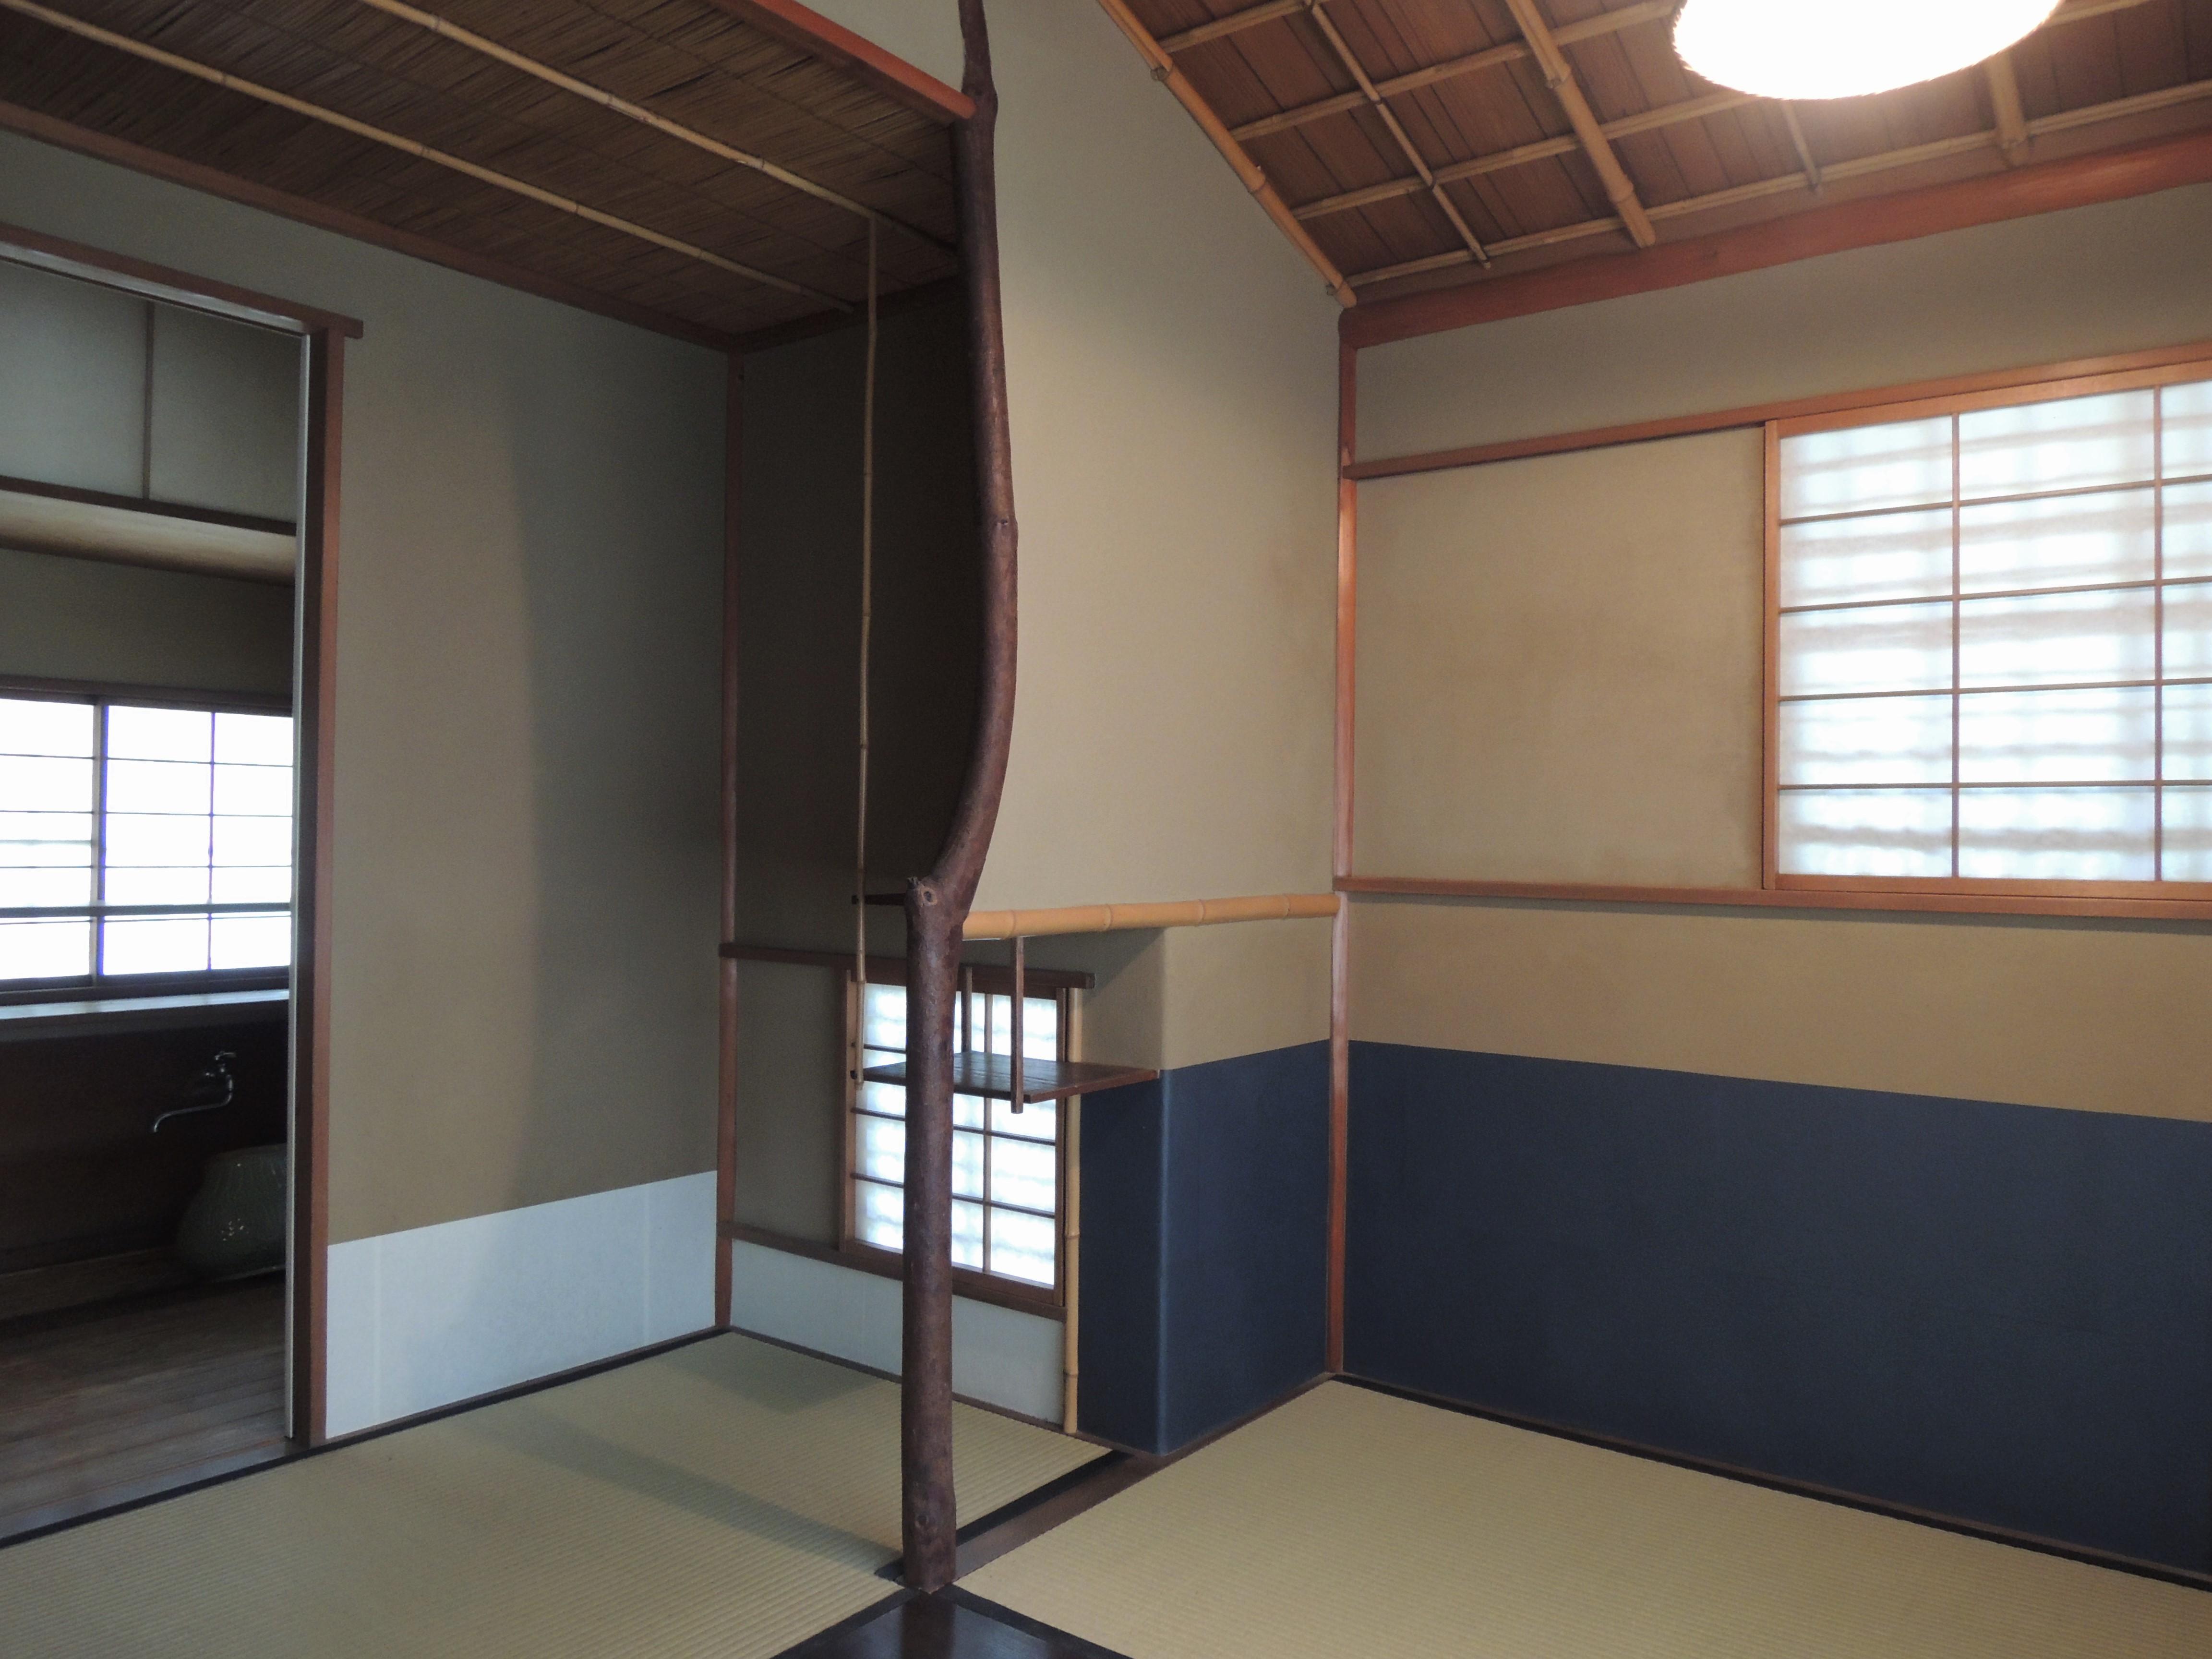 <p>3畳台目の茶室(2)</p>東面に躙口、屋根を葺き下ろして庇土間とし袖壁を立てる。右手に台目構えの点前座を構える。炉は台目切。